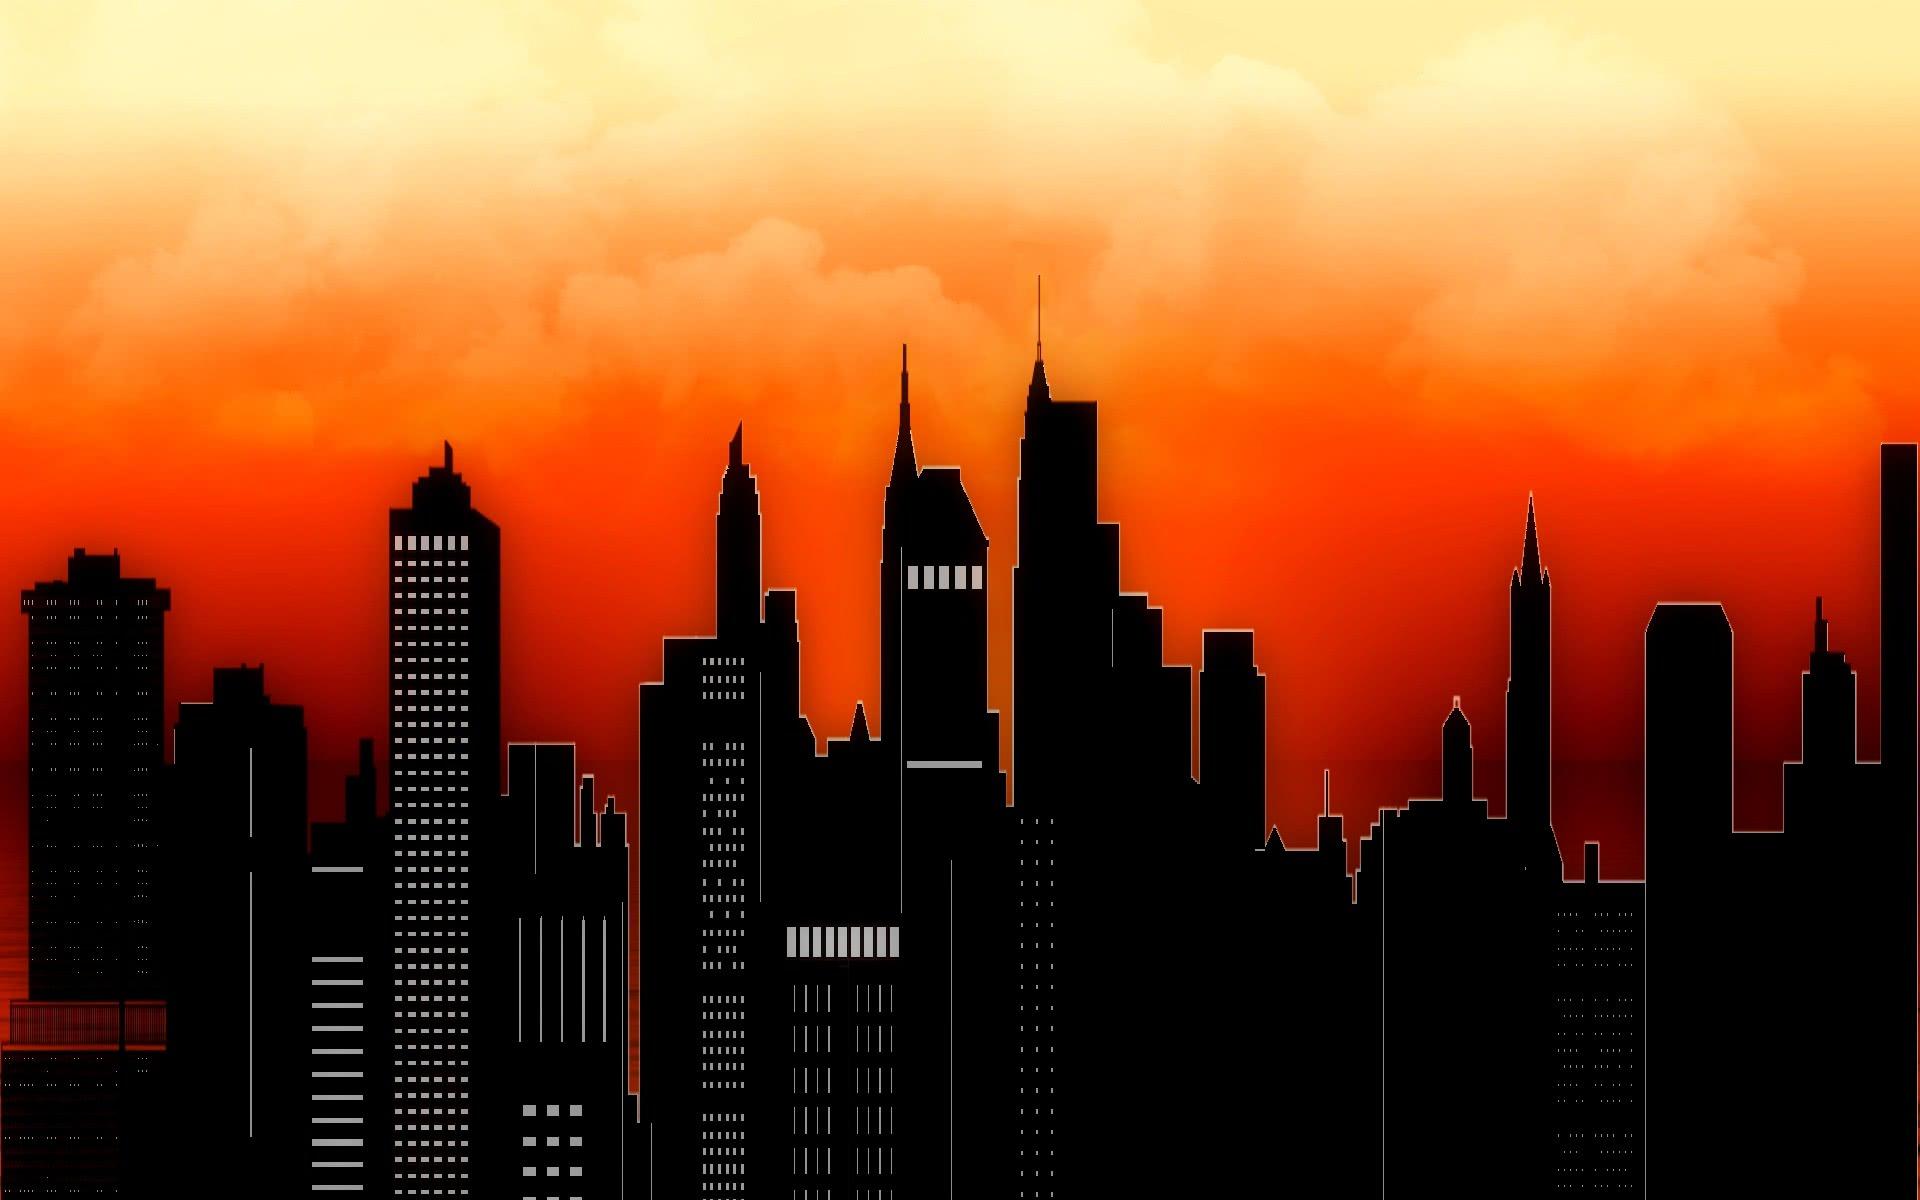 city skyline sunset  scenic  wallpaper  city  city skyline sunset jpg html